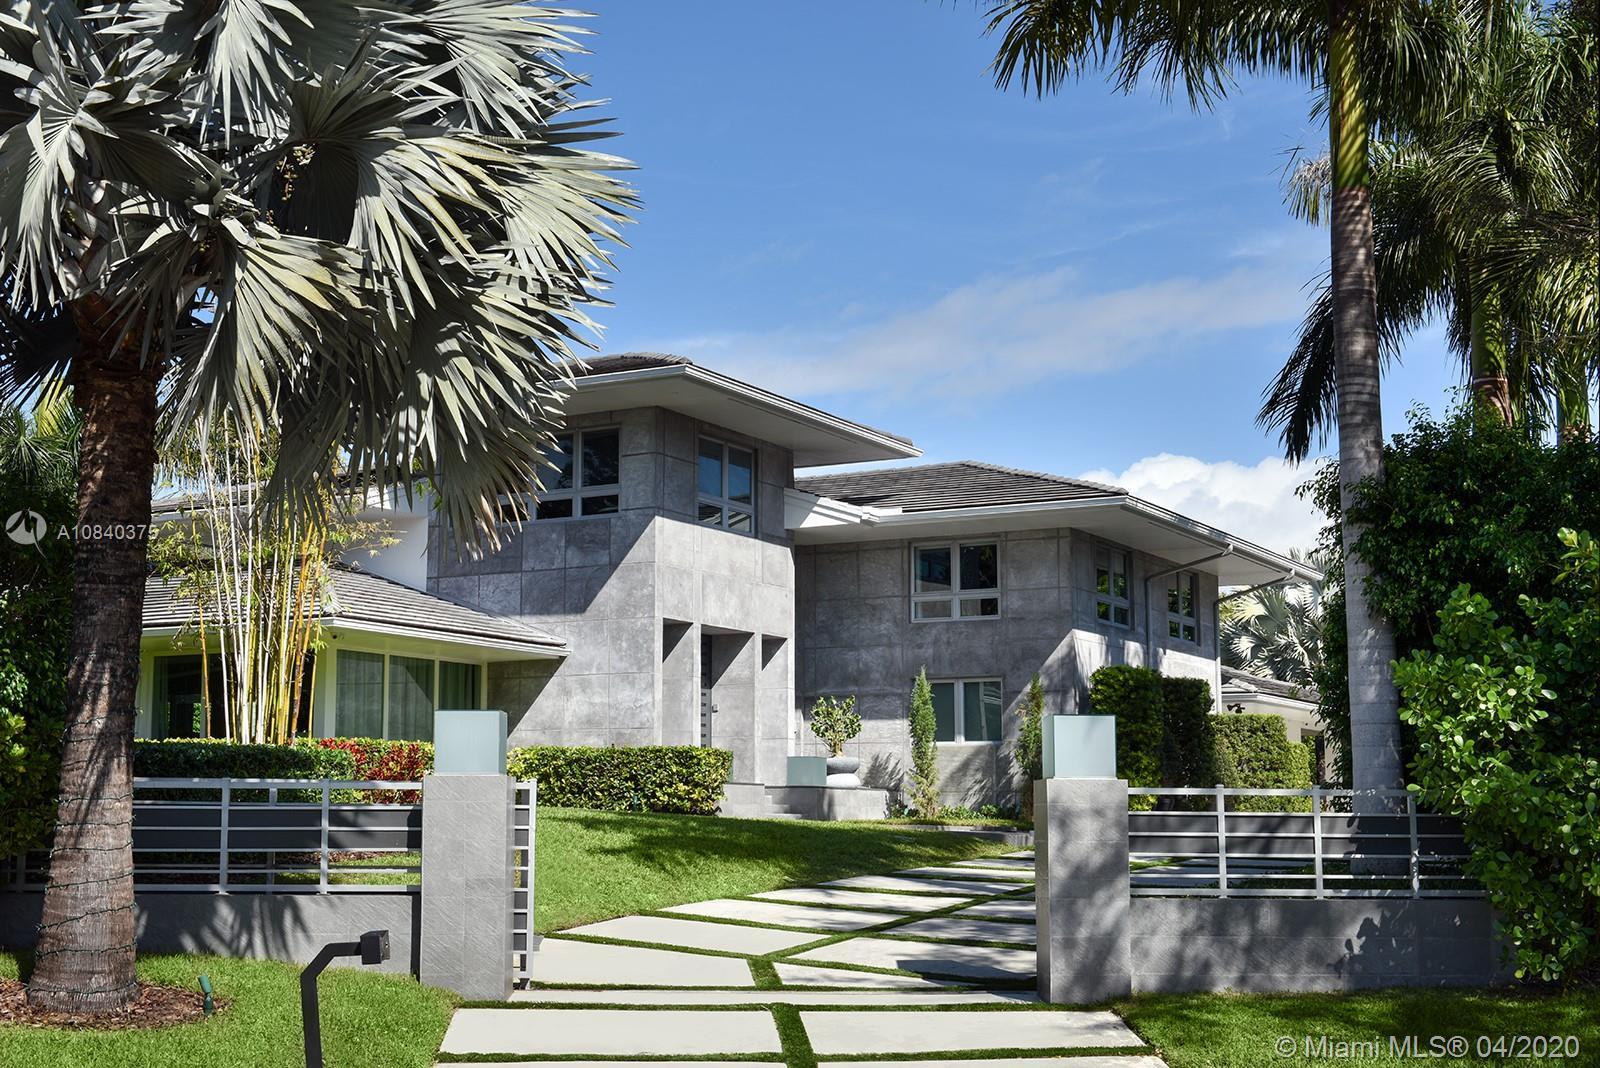 295 Vistalmar St, Coral Gables, Florida 33143, 6 Bedrooms Bedrooms, ,6 BathroomsBathrooms,Residential,For Sale,295 Vistalmar St,A10840375